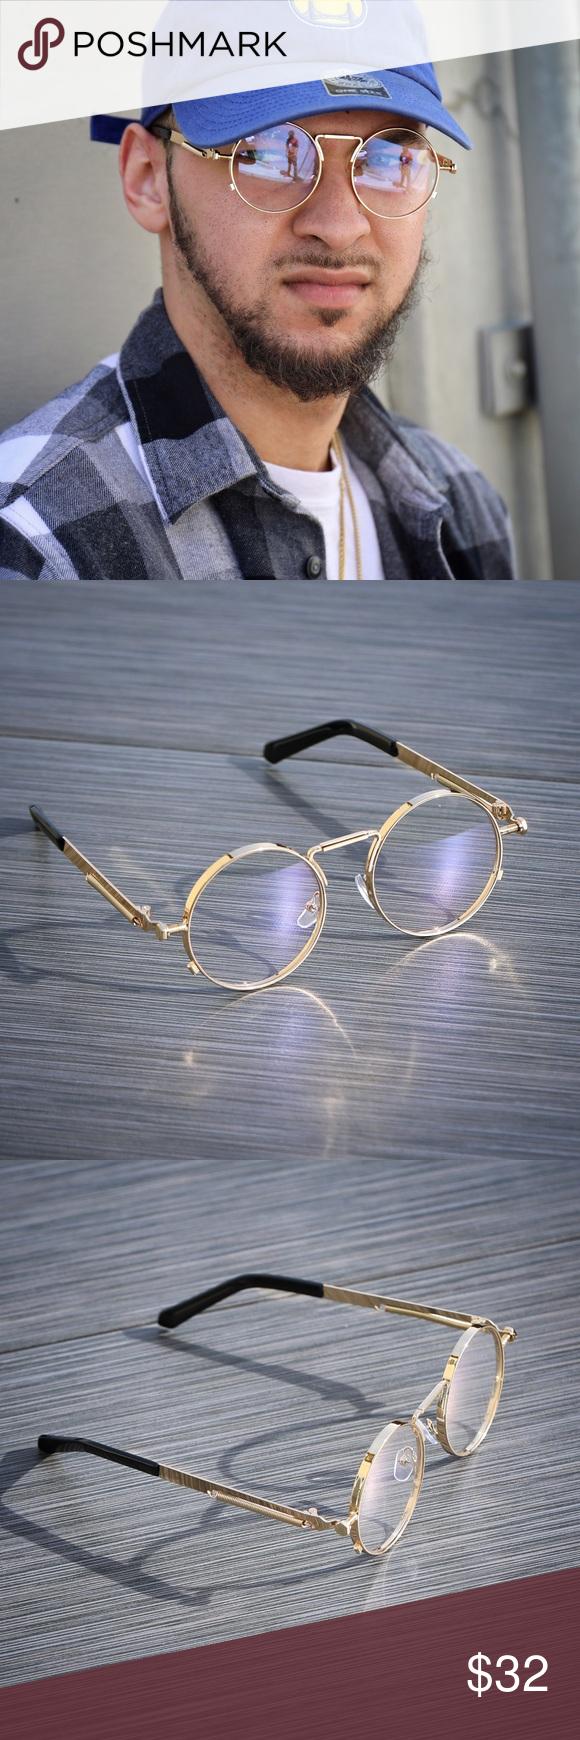 Mens Hip Hop Round Gold Frame Clear Eye Glasses Boutique